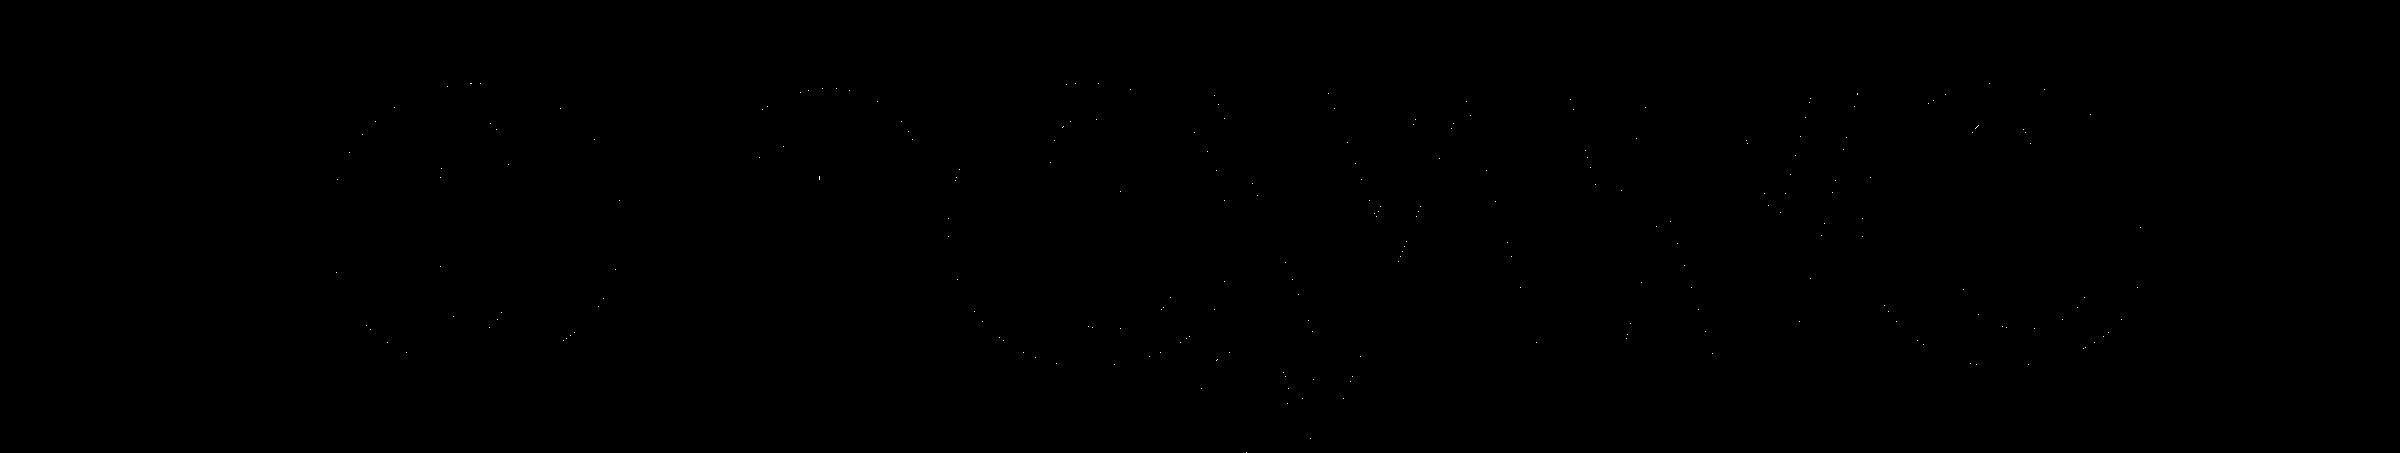 Honeywell Logo PNG Transparent & SVG Vector - Freebie Supply